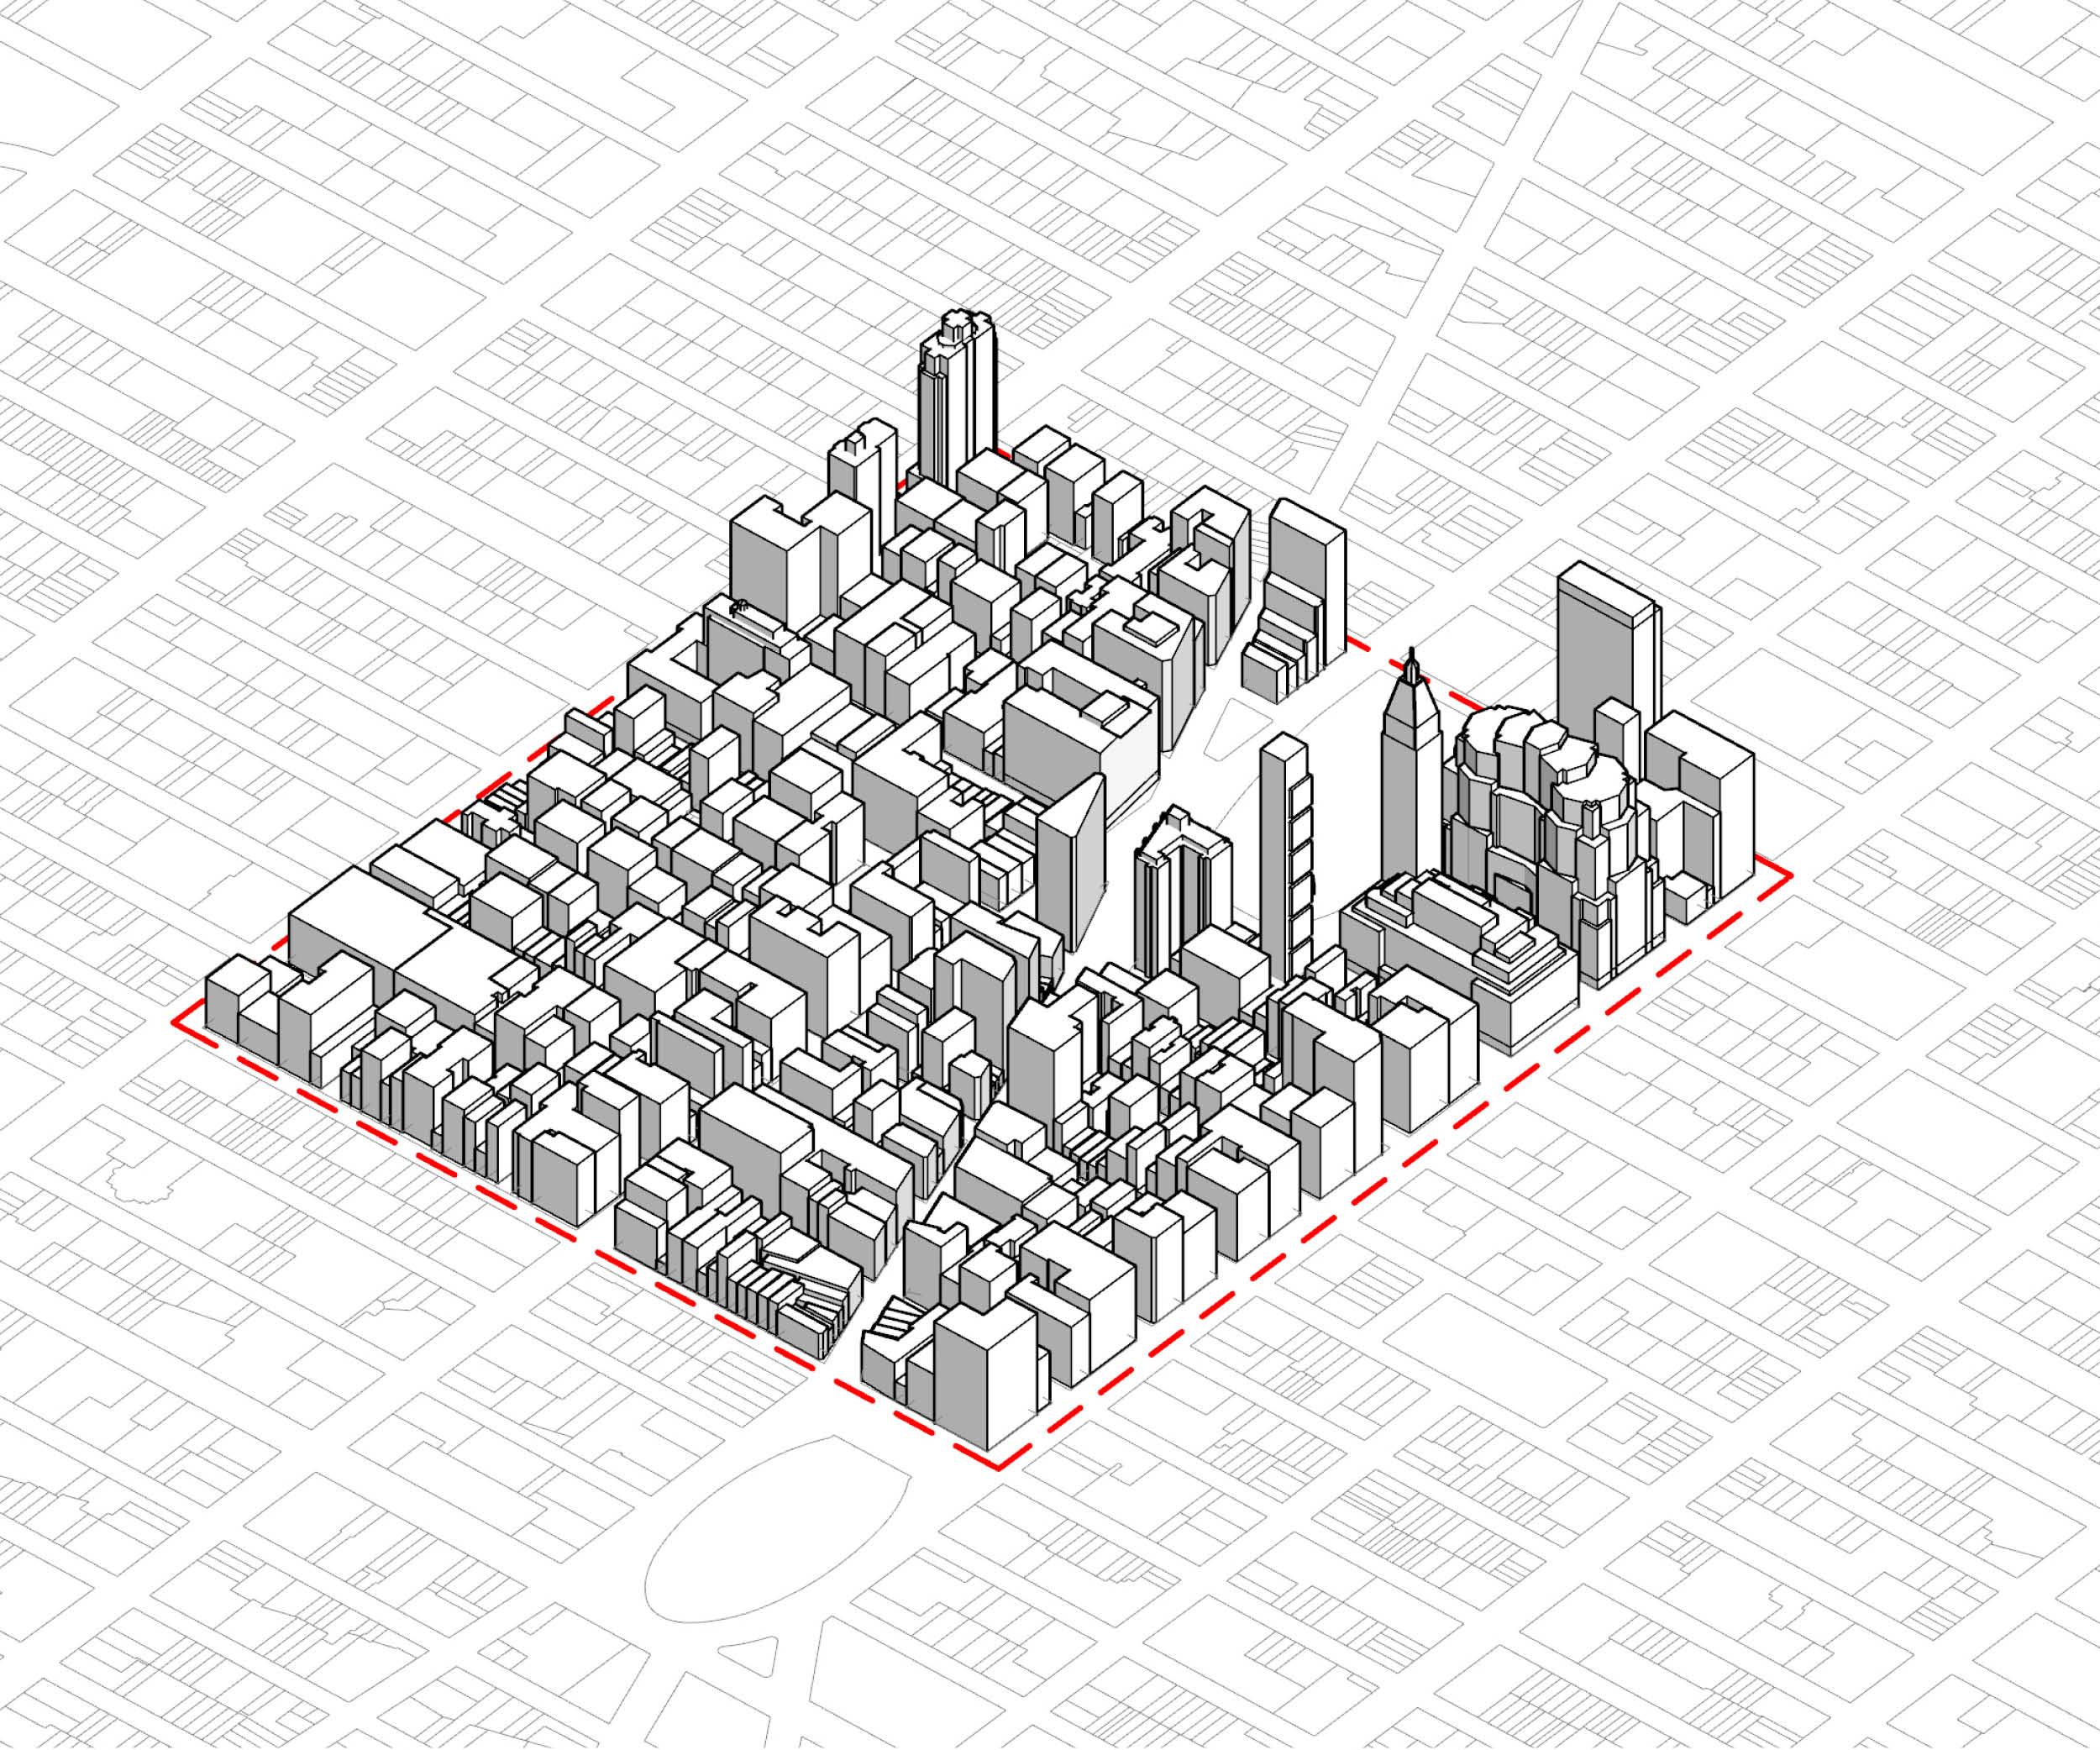 Flatiron District   LD FAR: 5.3  NYC FAR: 8.0